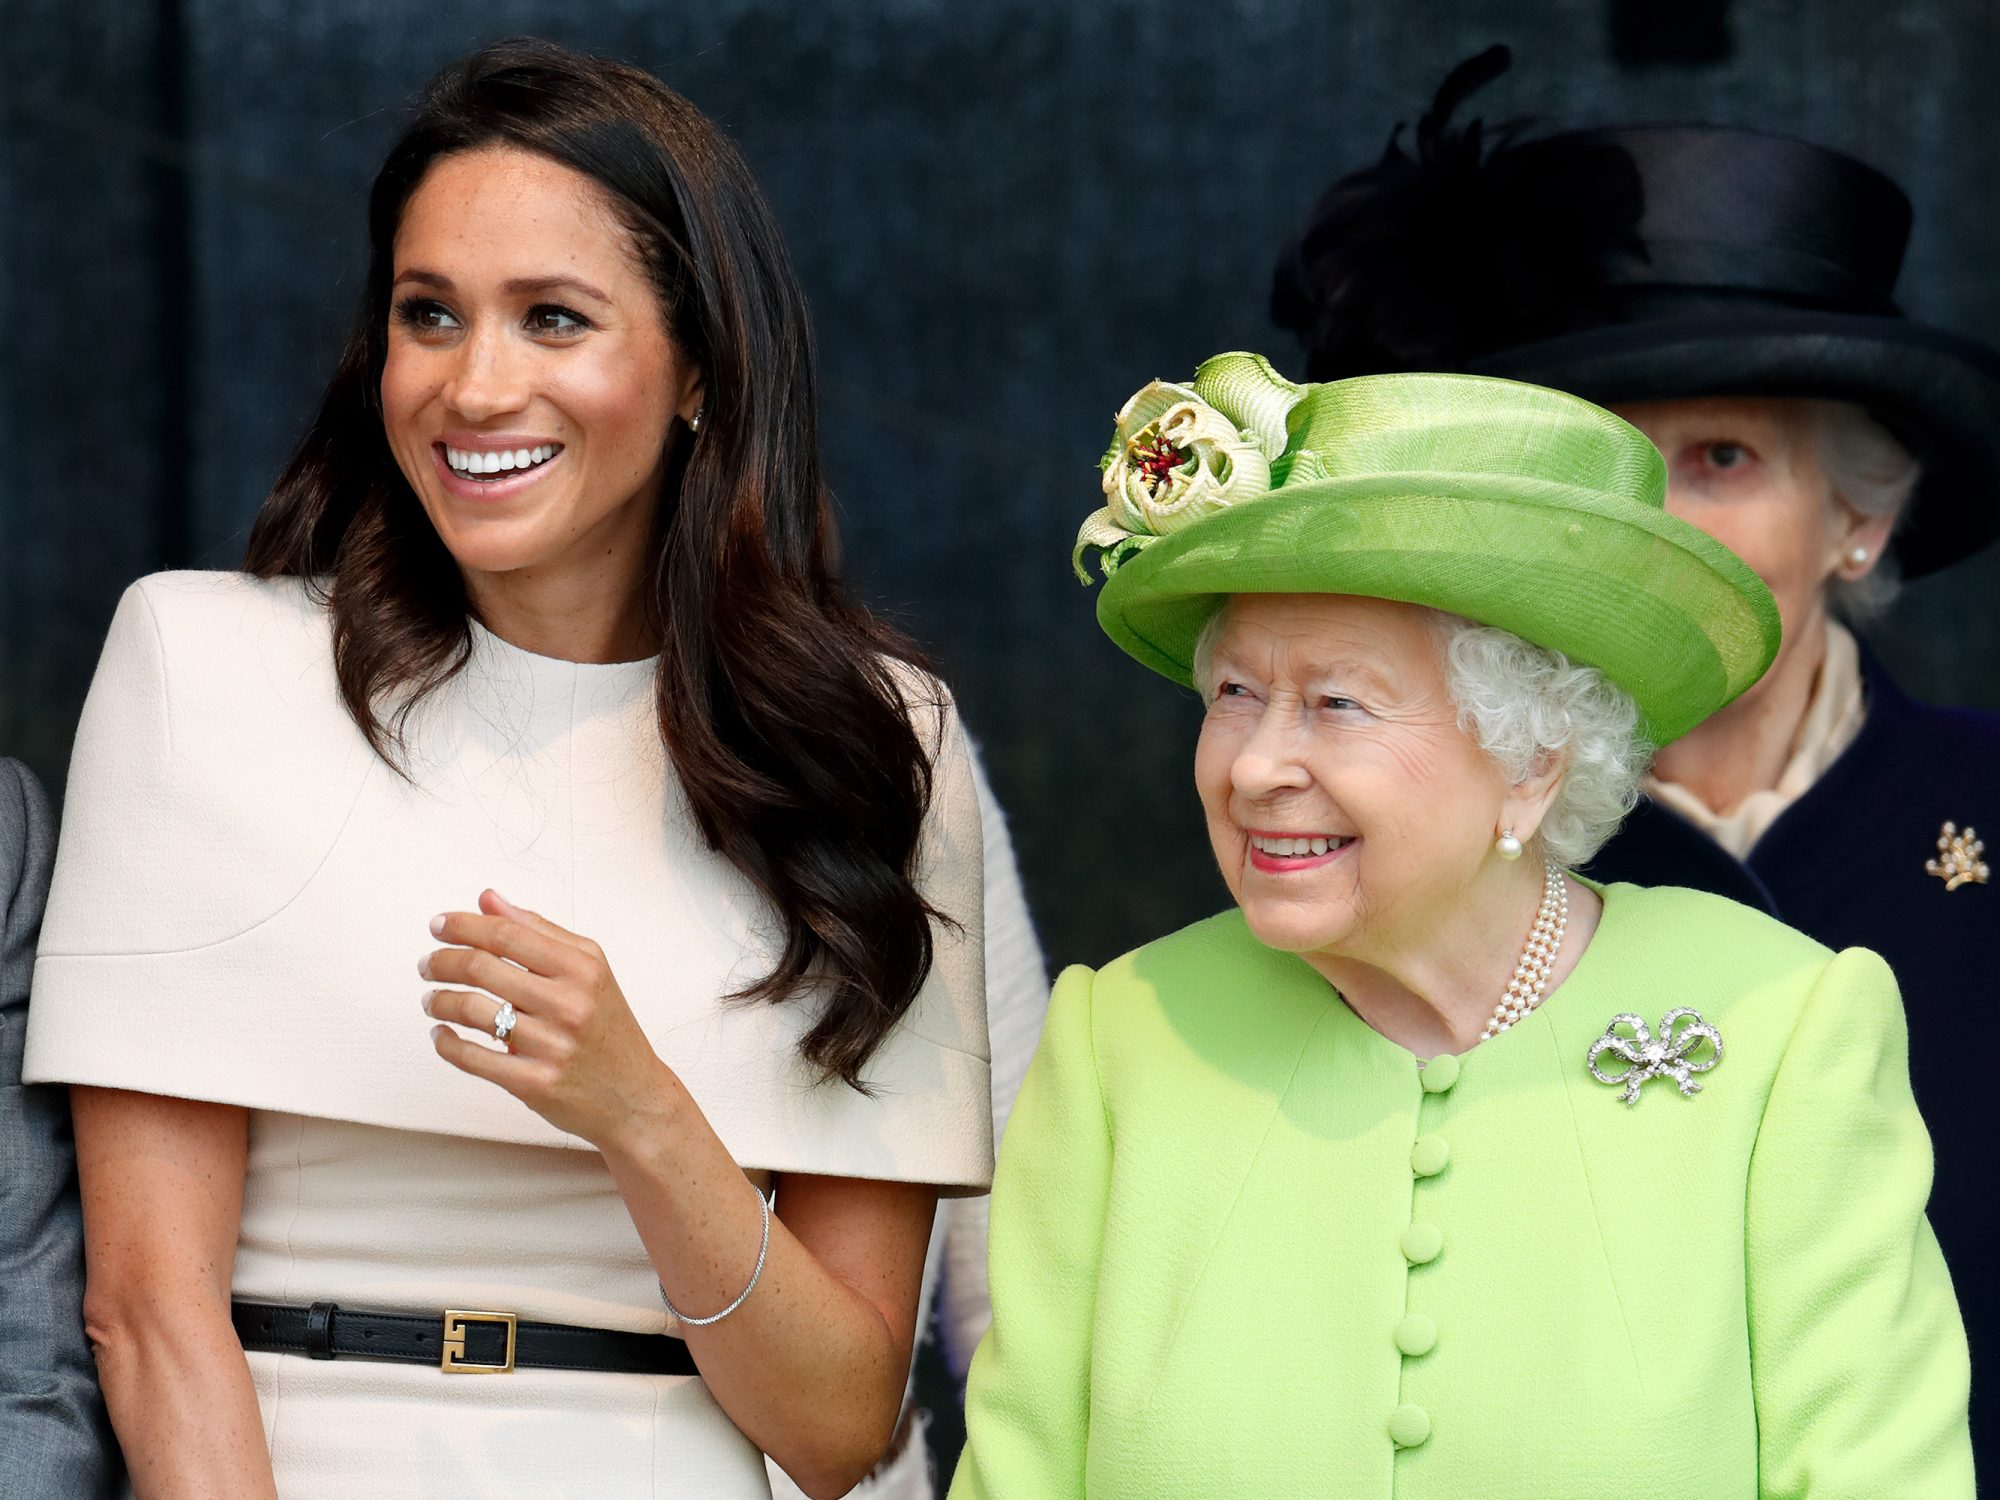 Did Meghan Markle Just Break Royal Diet Restrictions?